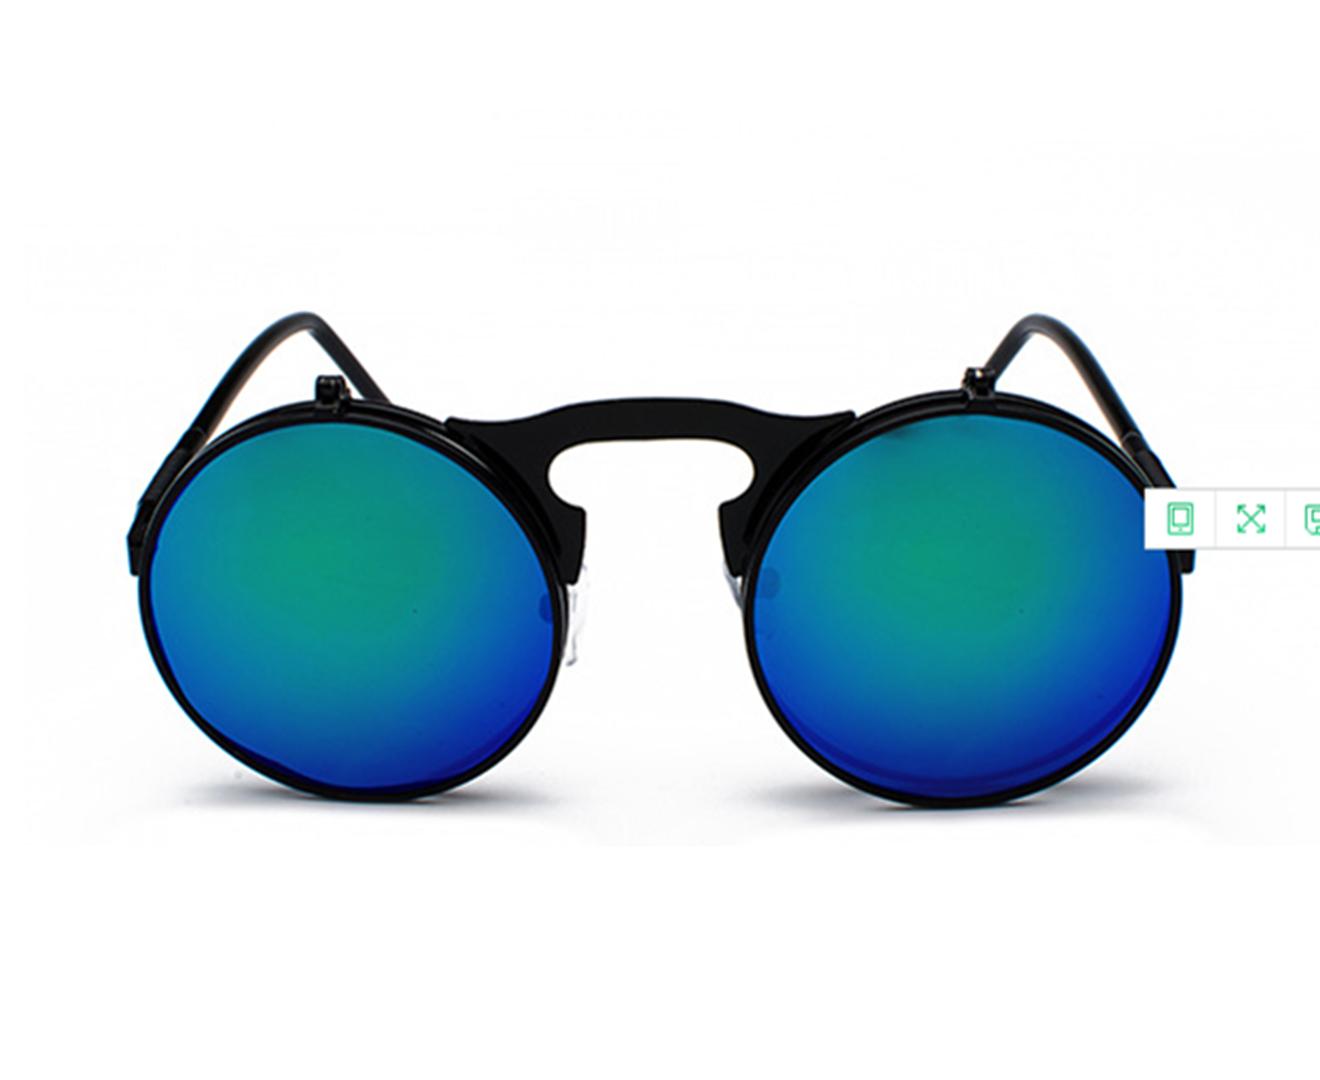 Retro Steam Punk Sunglasses Round Flip Up Metal Frame Sunglasses Women Men